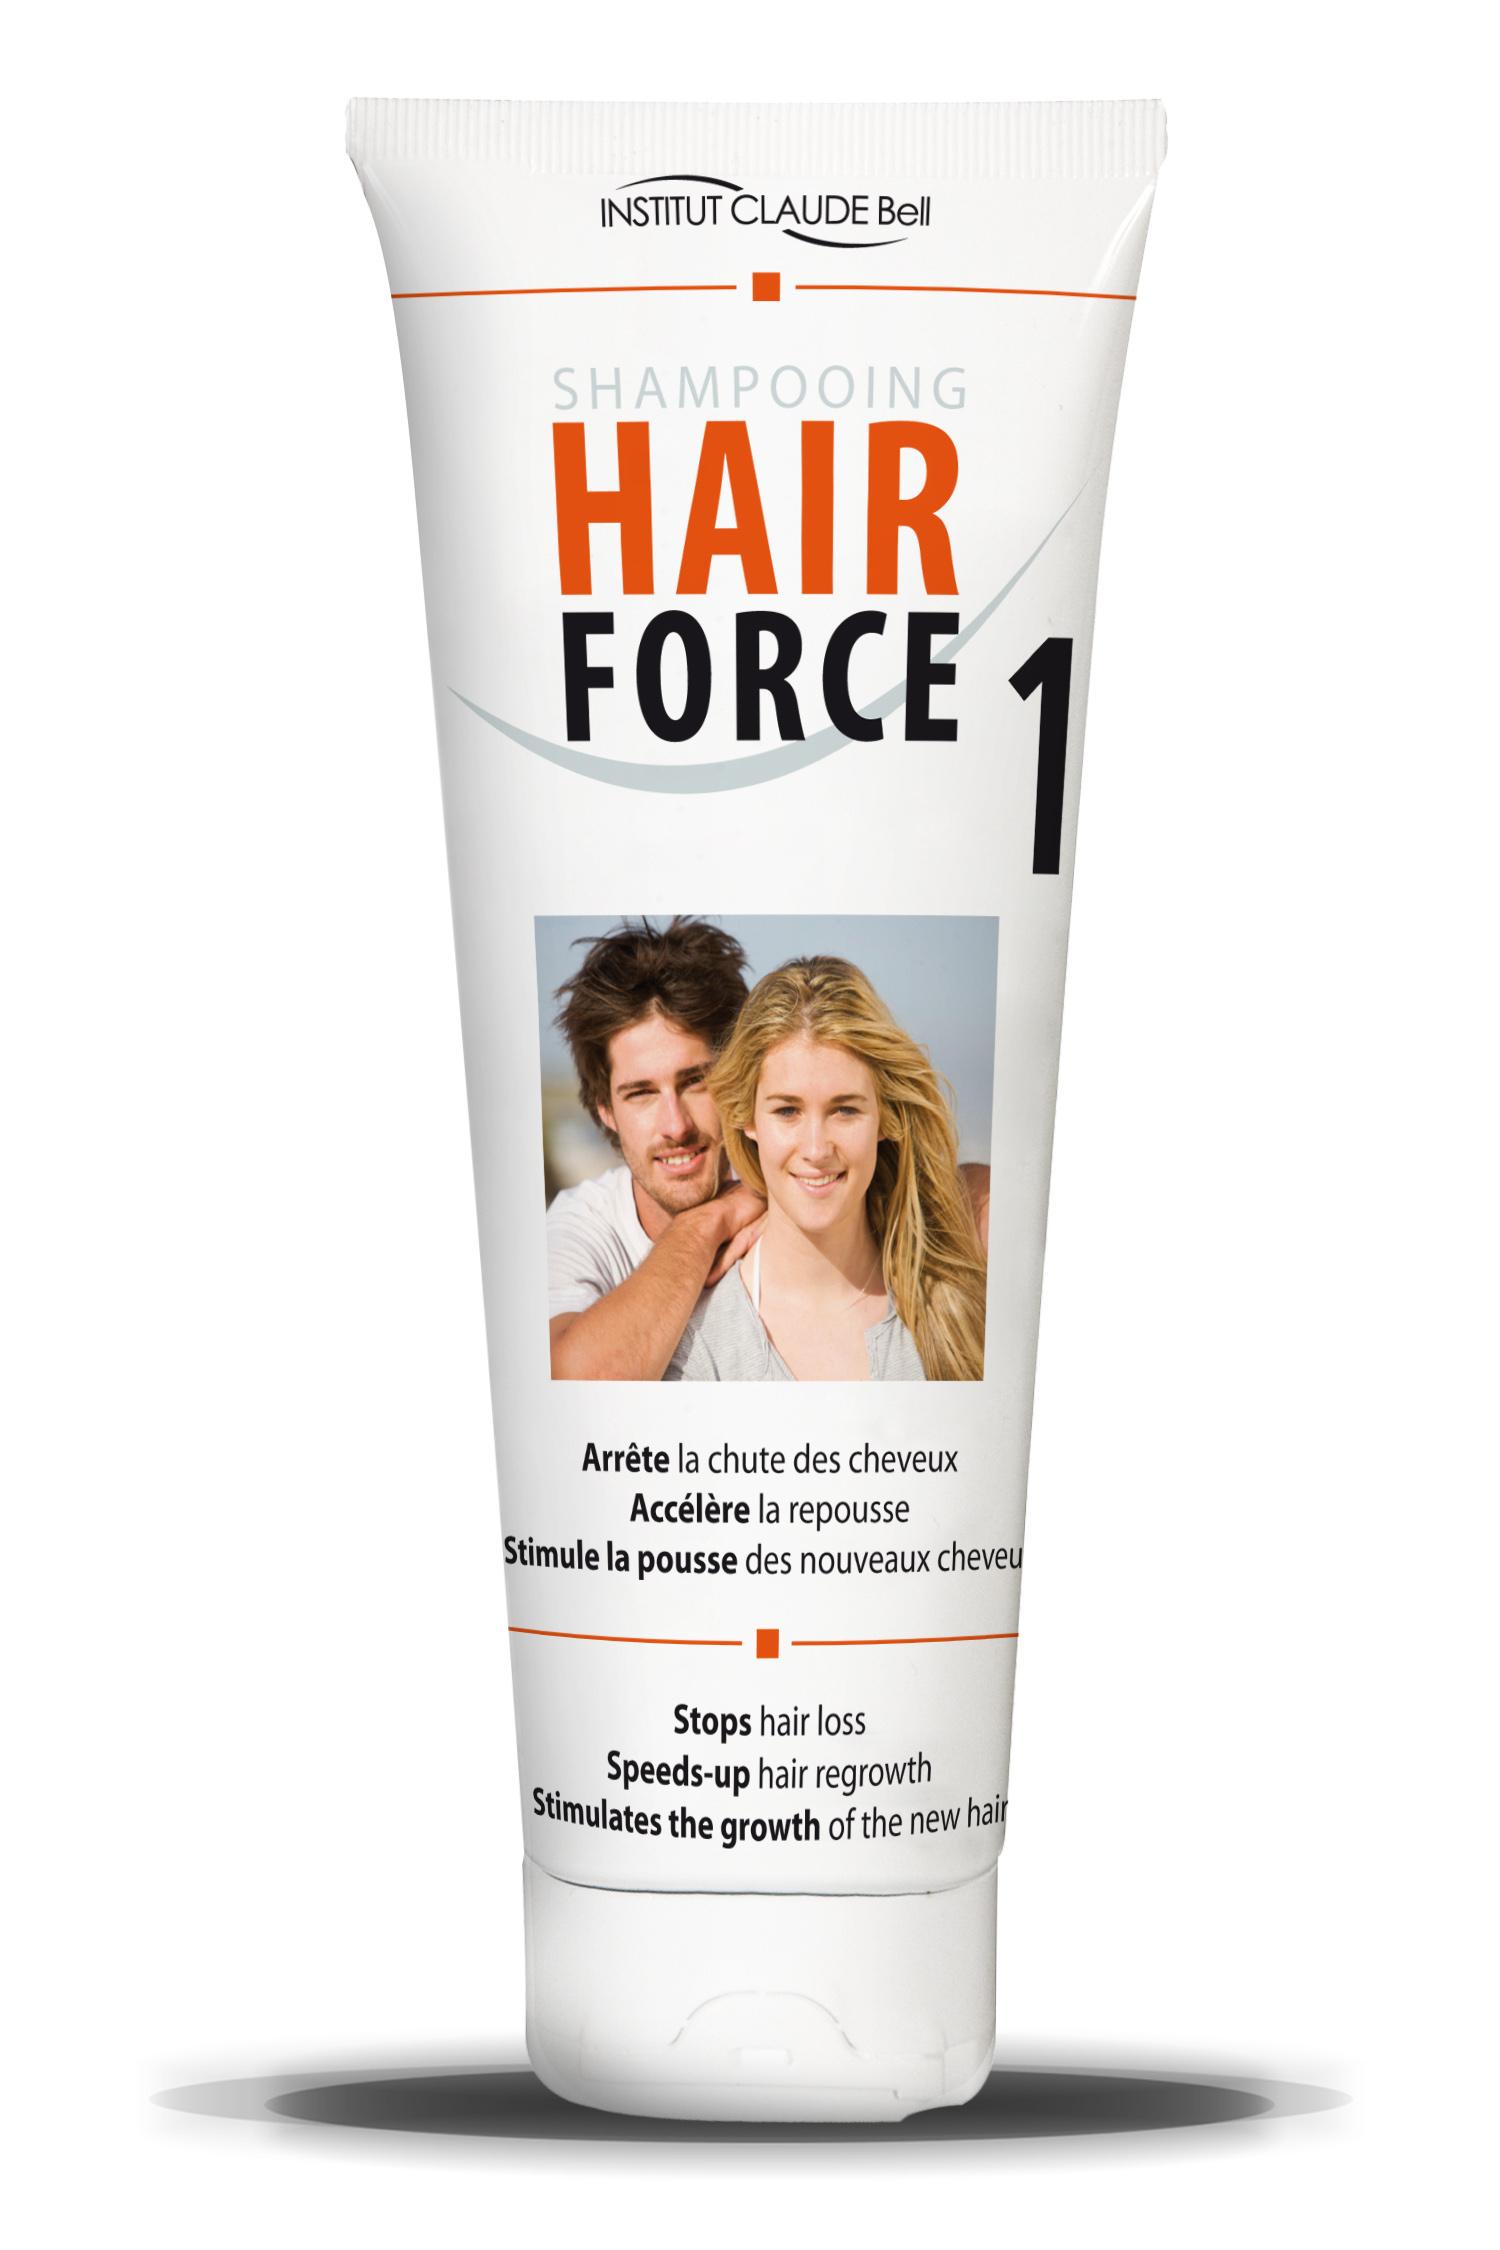 hair force one shampoo f r schnelleres haarwachstum 250. Black Bedroom Furniture Sets. Home Design Ideas